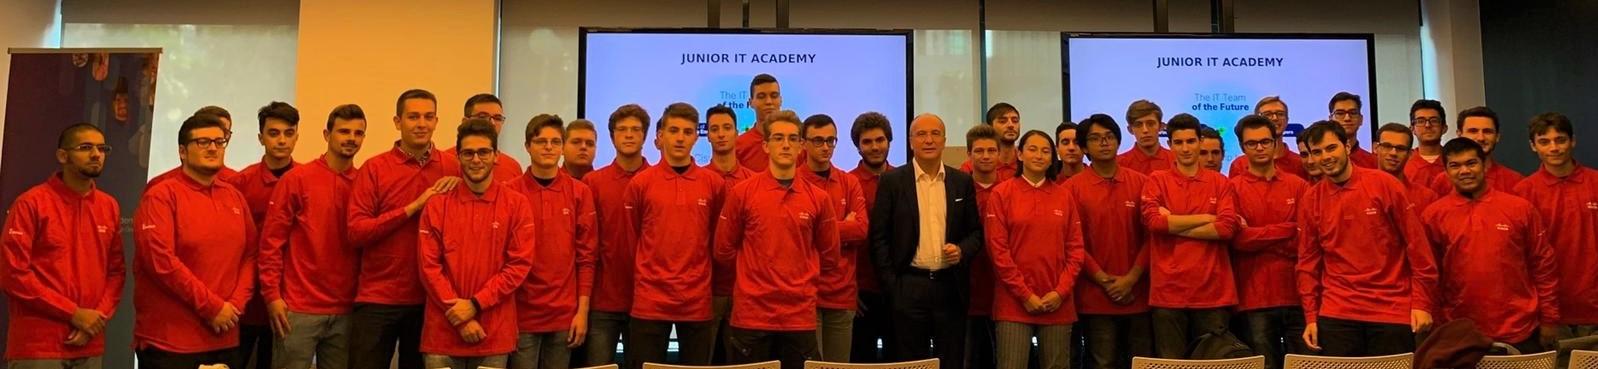 Open Day Junior IT Academy